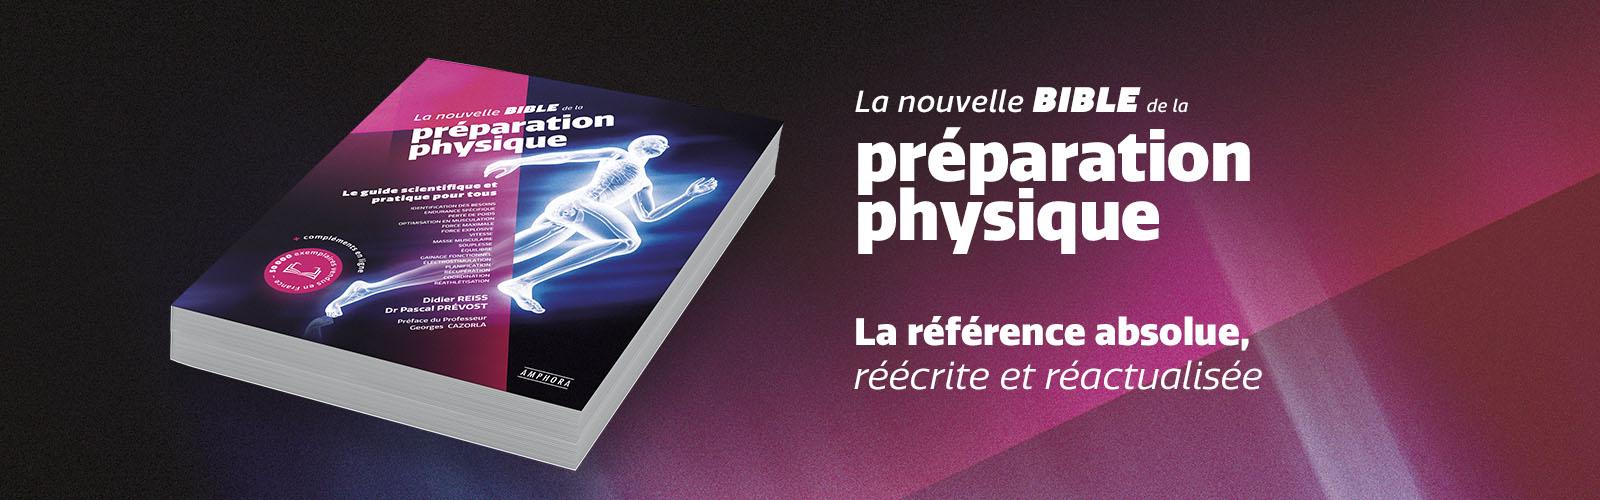 Bible_prepa_physique_slide_v1